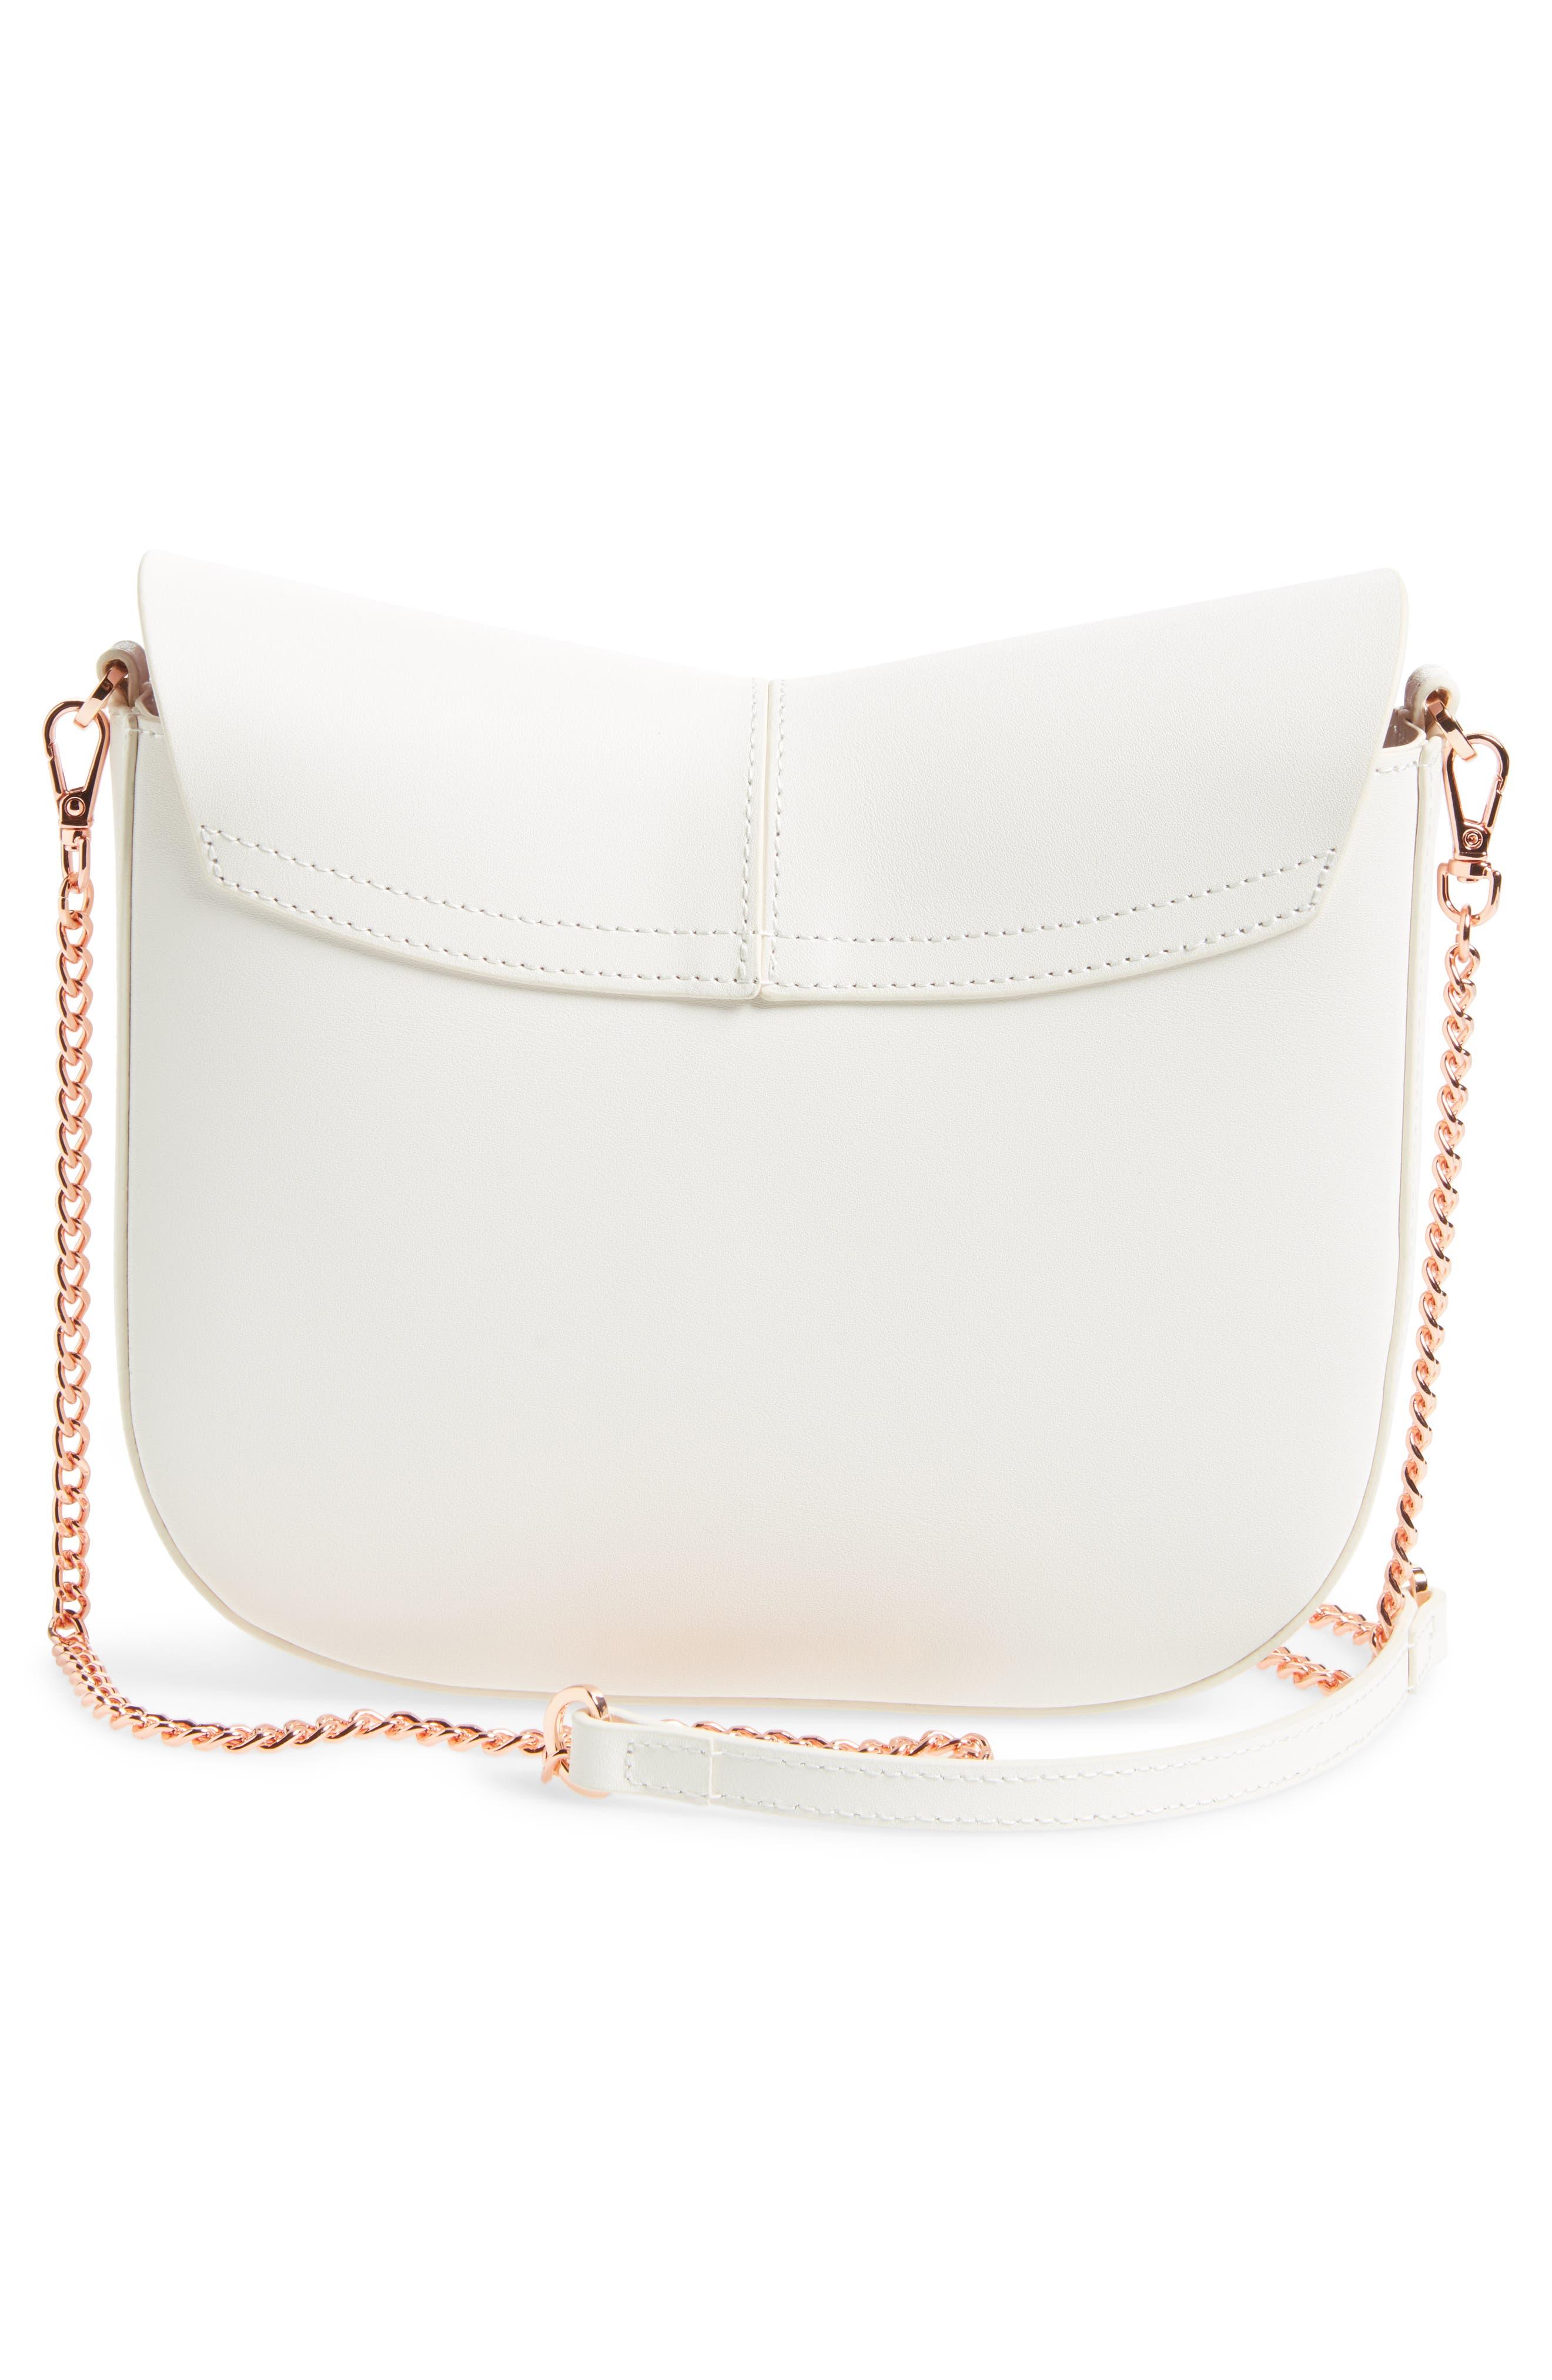 Chriiss Cat Stud Leather Crossbody Bag,                             Alternate thumbnail 9, color,